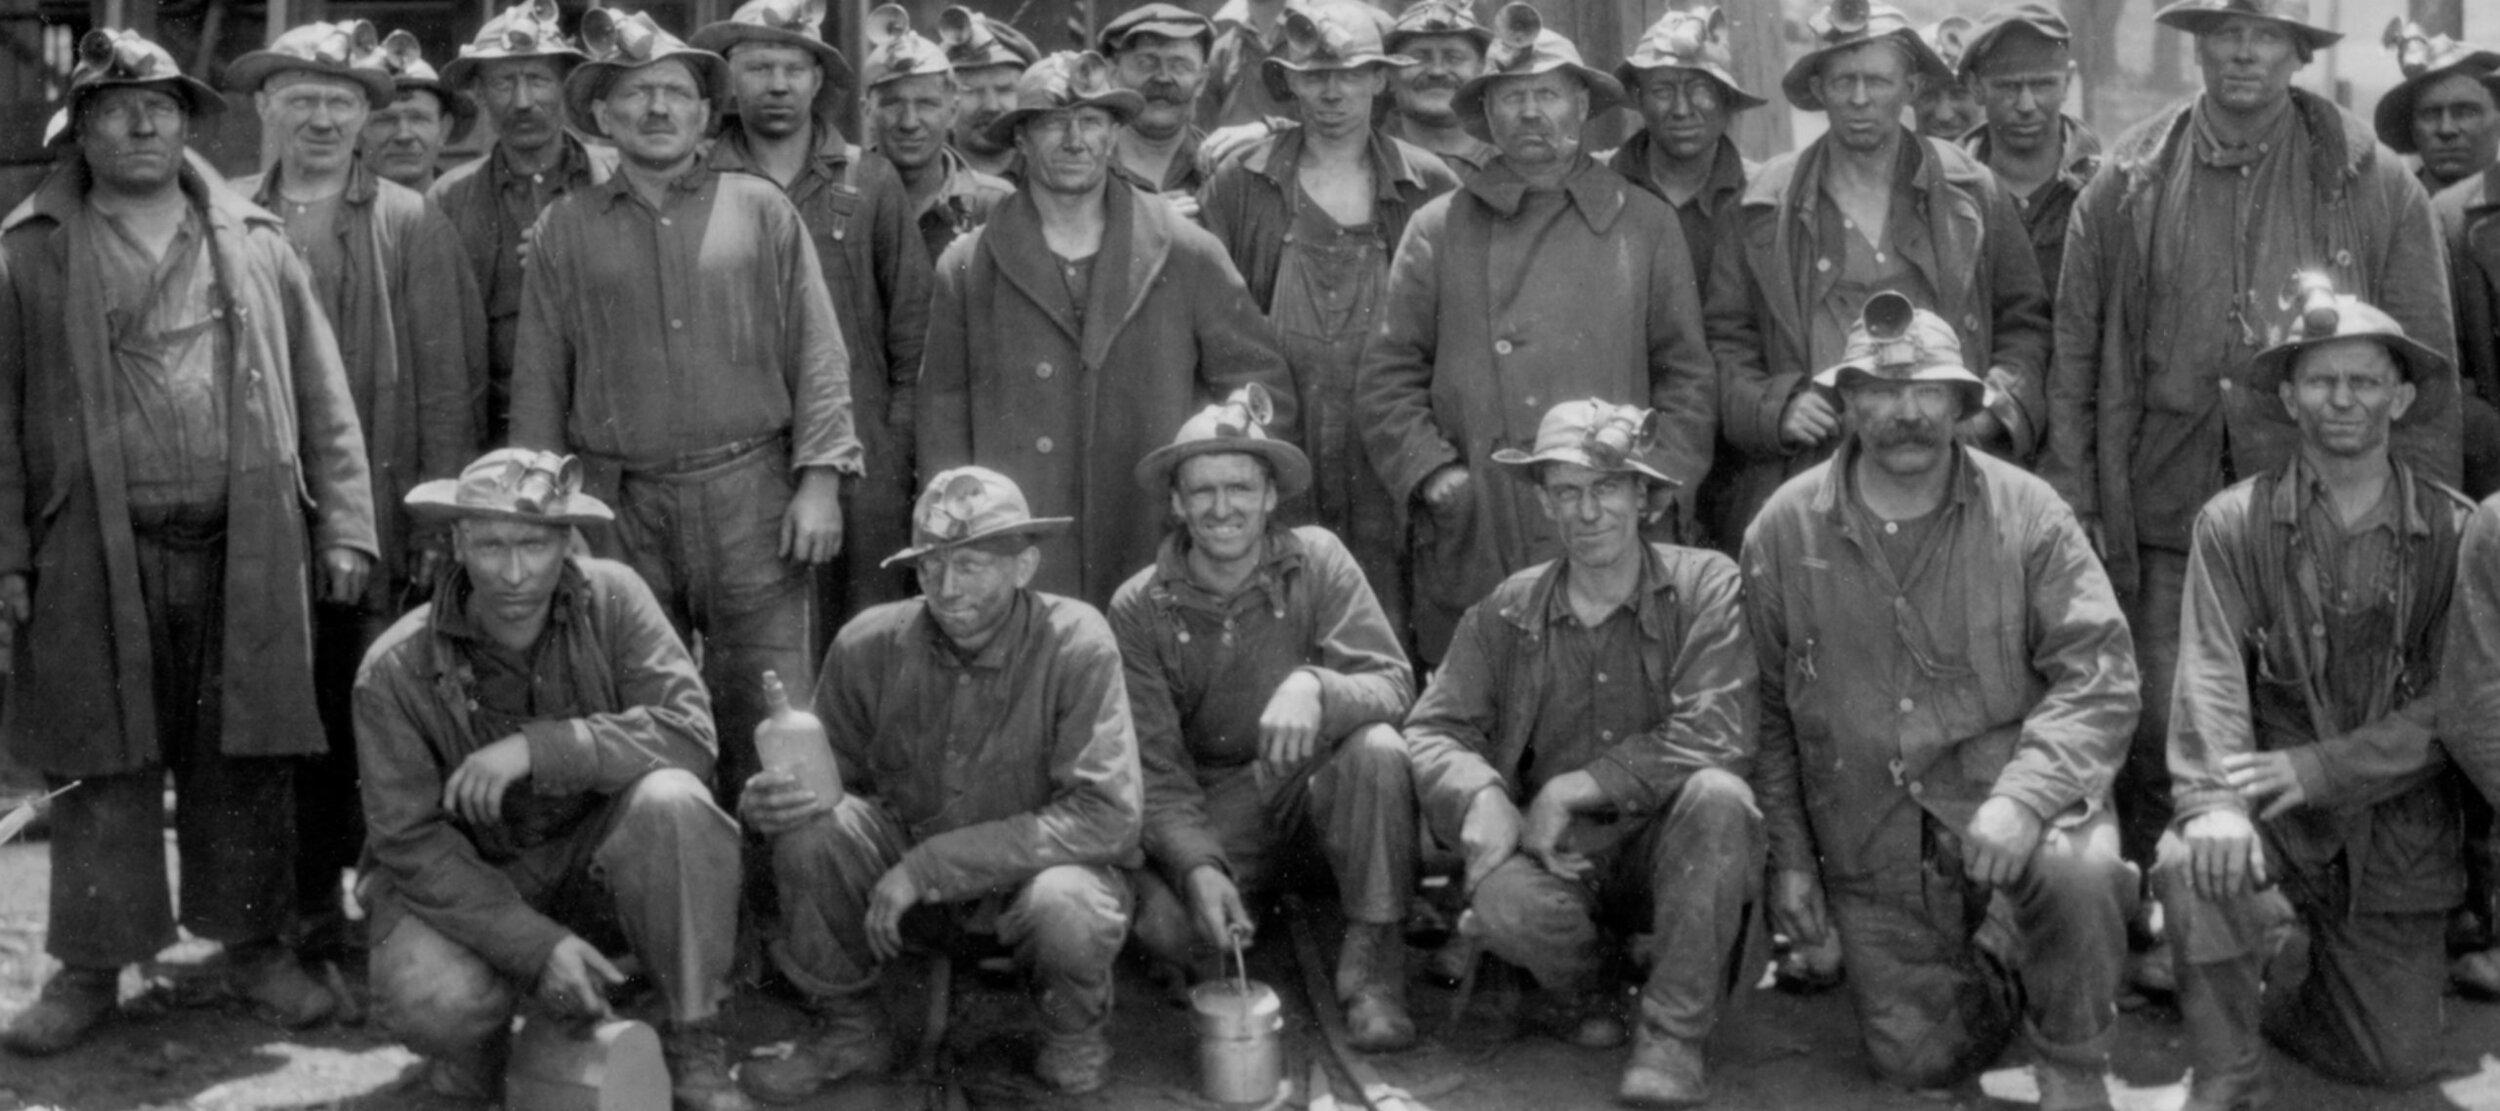 Cousin Jack Cornish miners at Tamarack, Keweenaw, Michigan